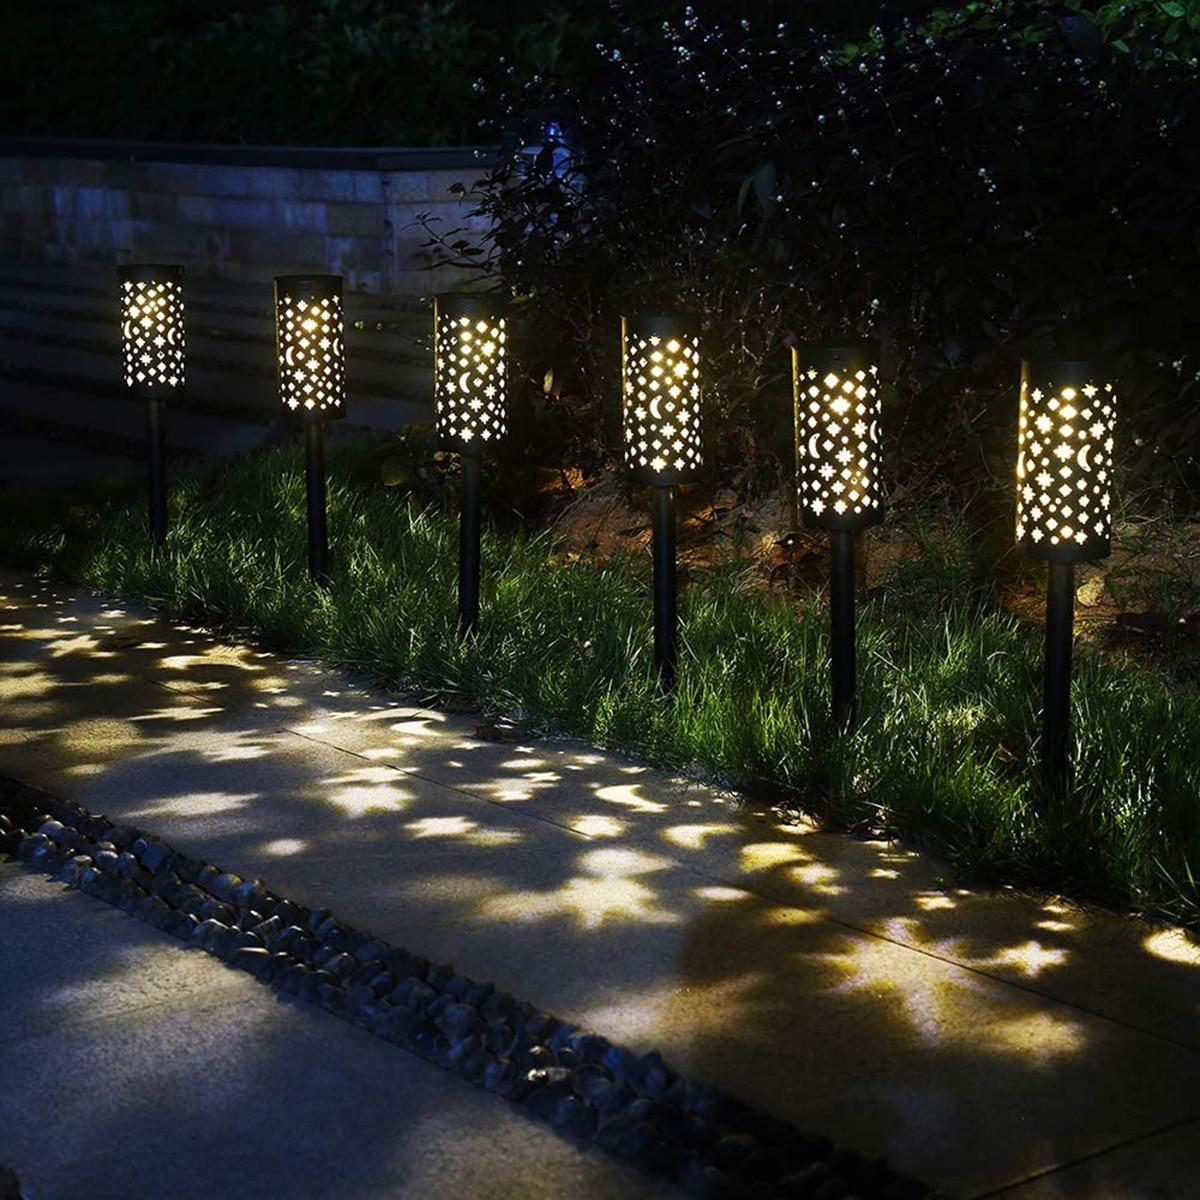 Hollow-out Solar Lamp Convenient Practical Durable Landscape Light Ground Plug Lamp Solar Lamp for Outdoor Outside Garden